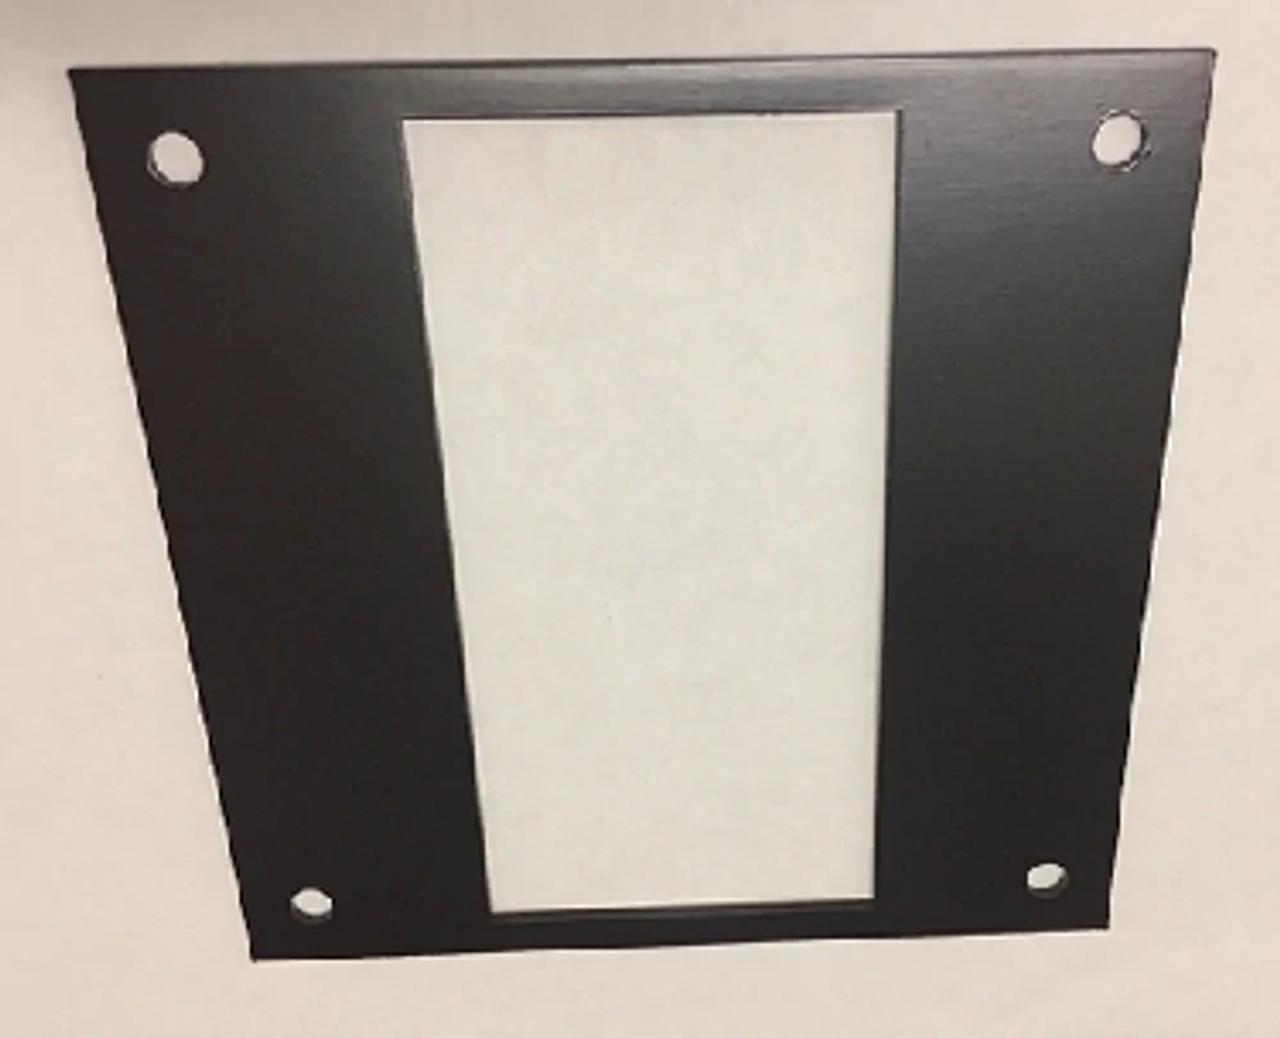 panel adapter